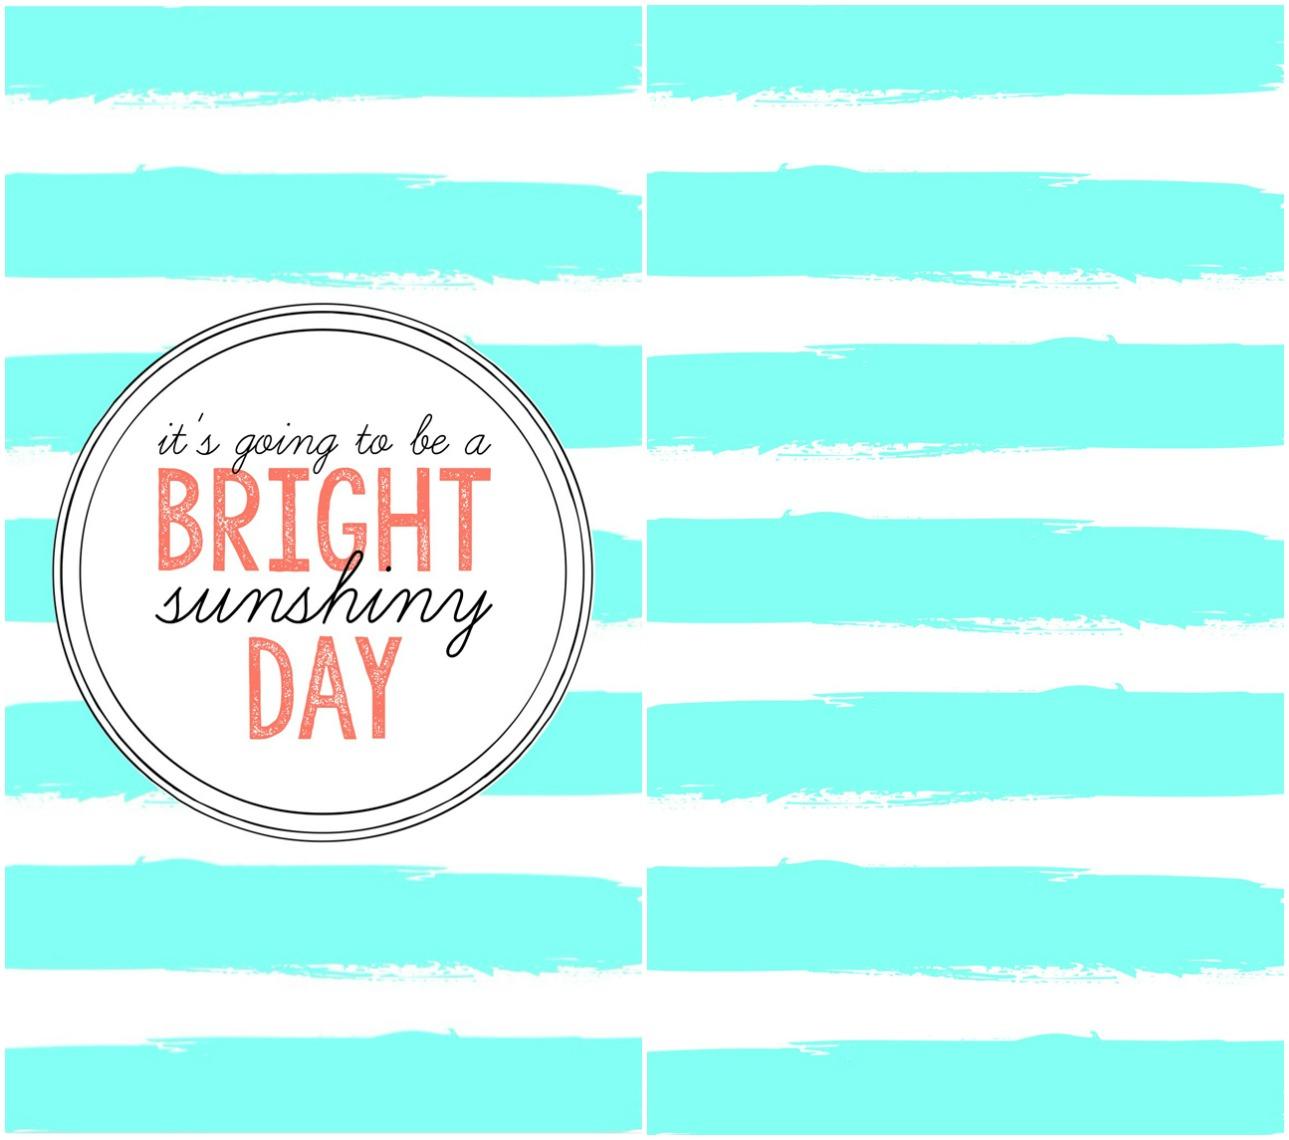 Bright Sunshiny Day Phone Wallpaper